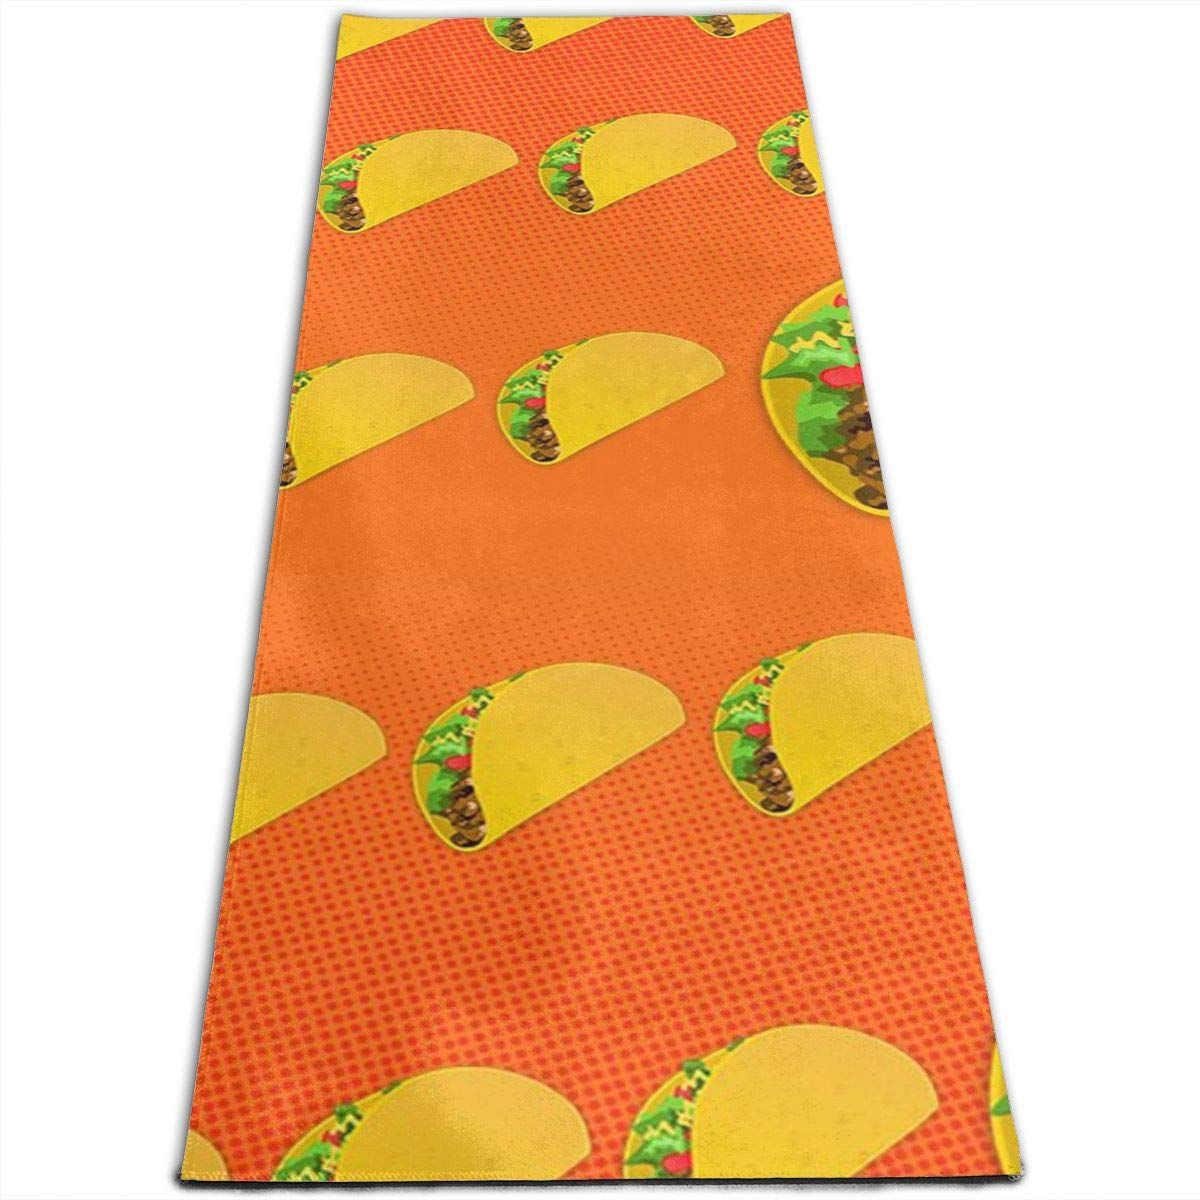 Amazon.com: Bghnifs Taco Pattern Funny Pattern Printed ...